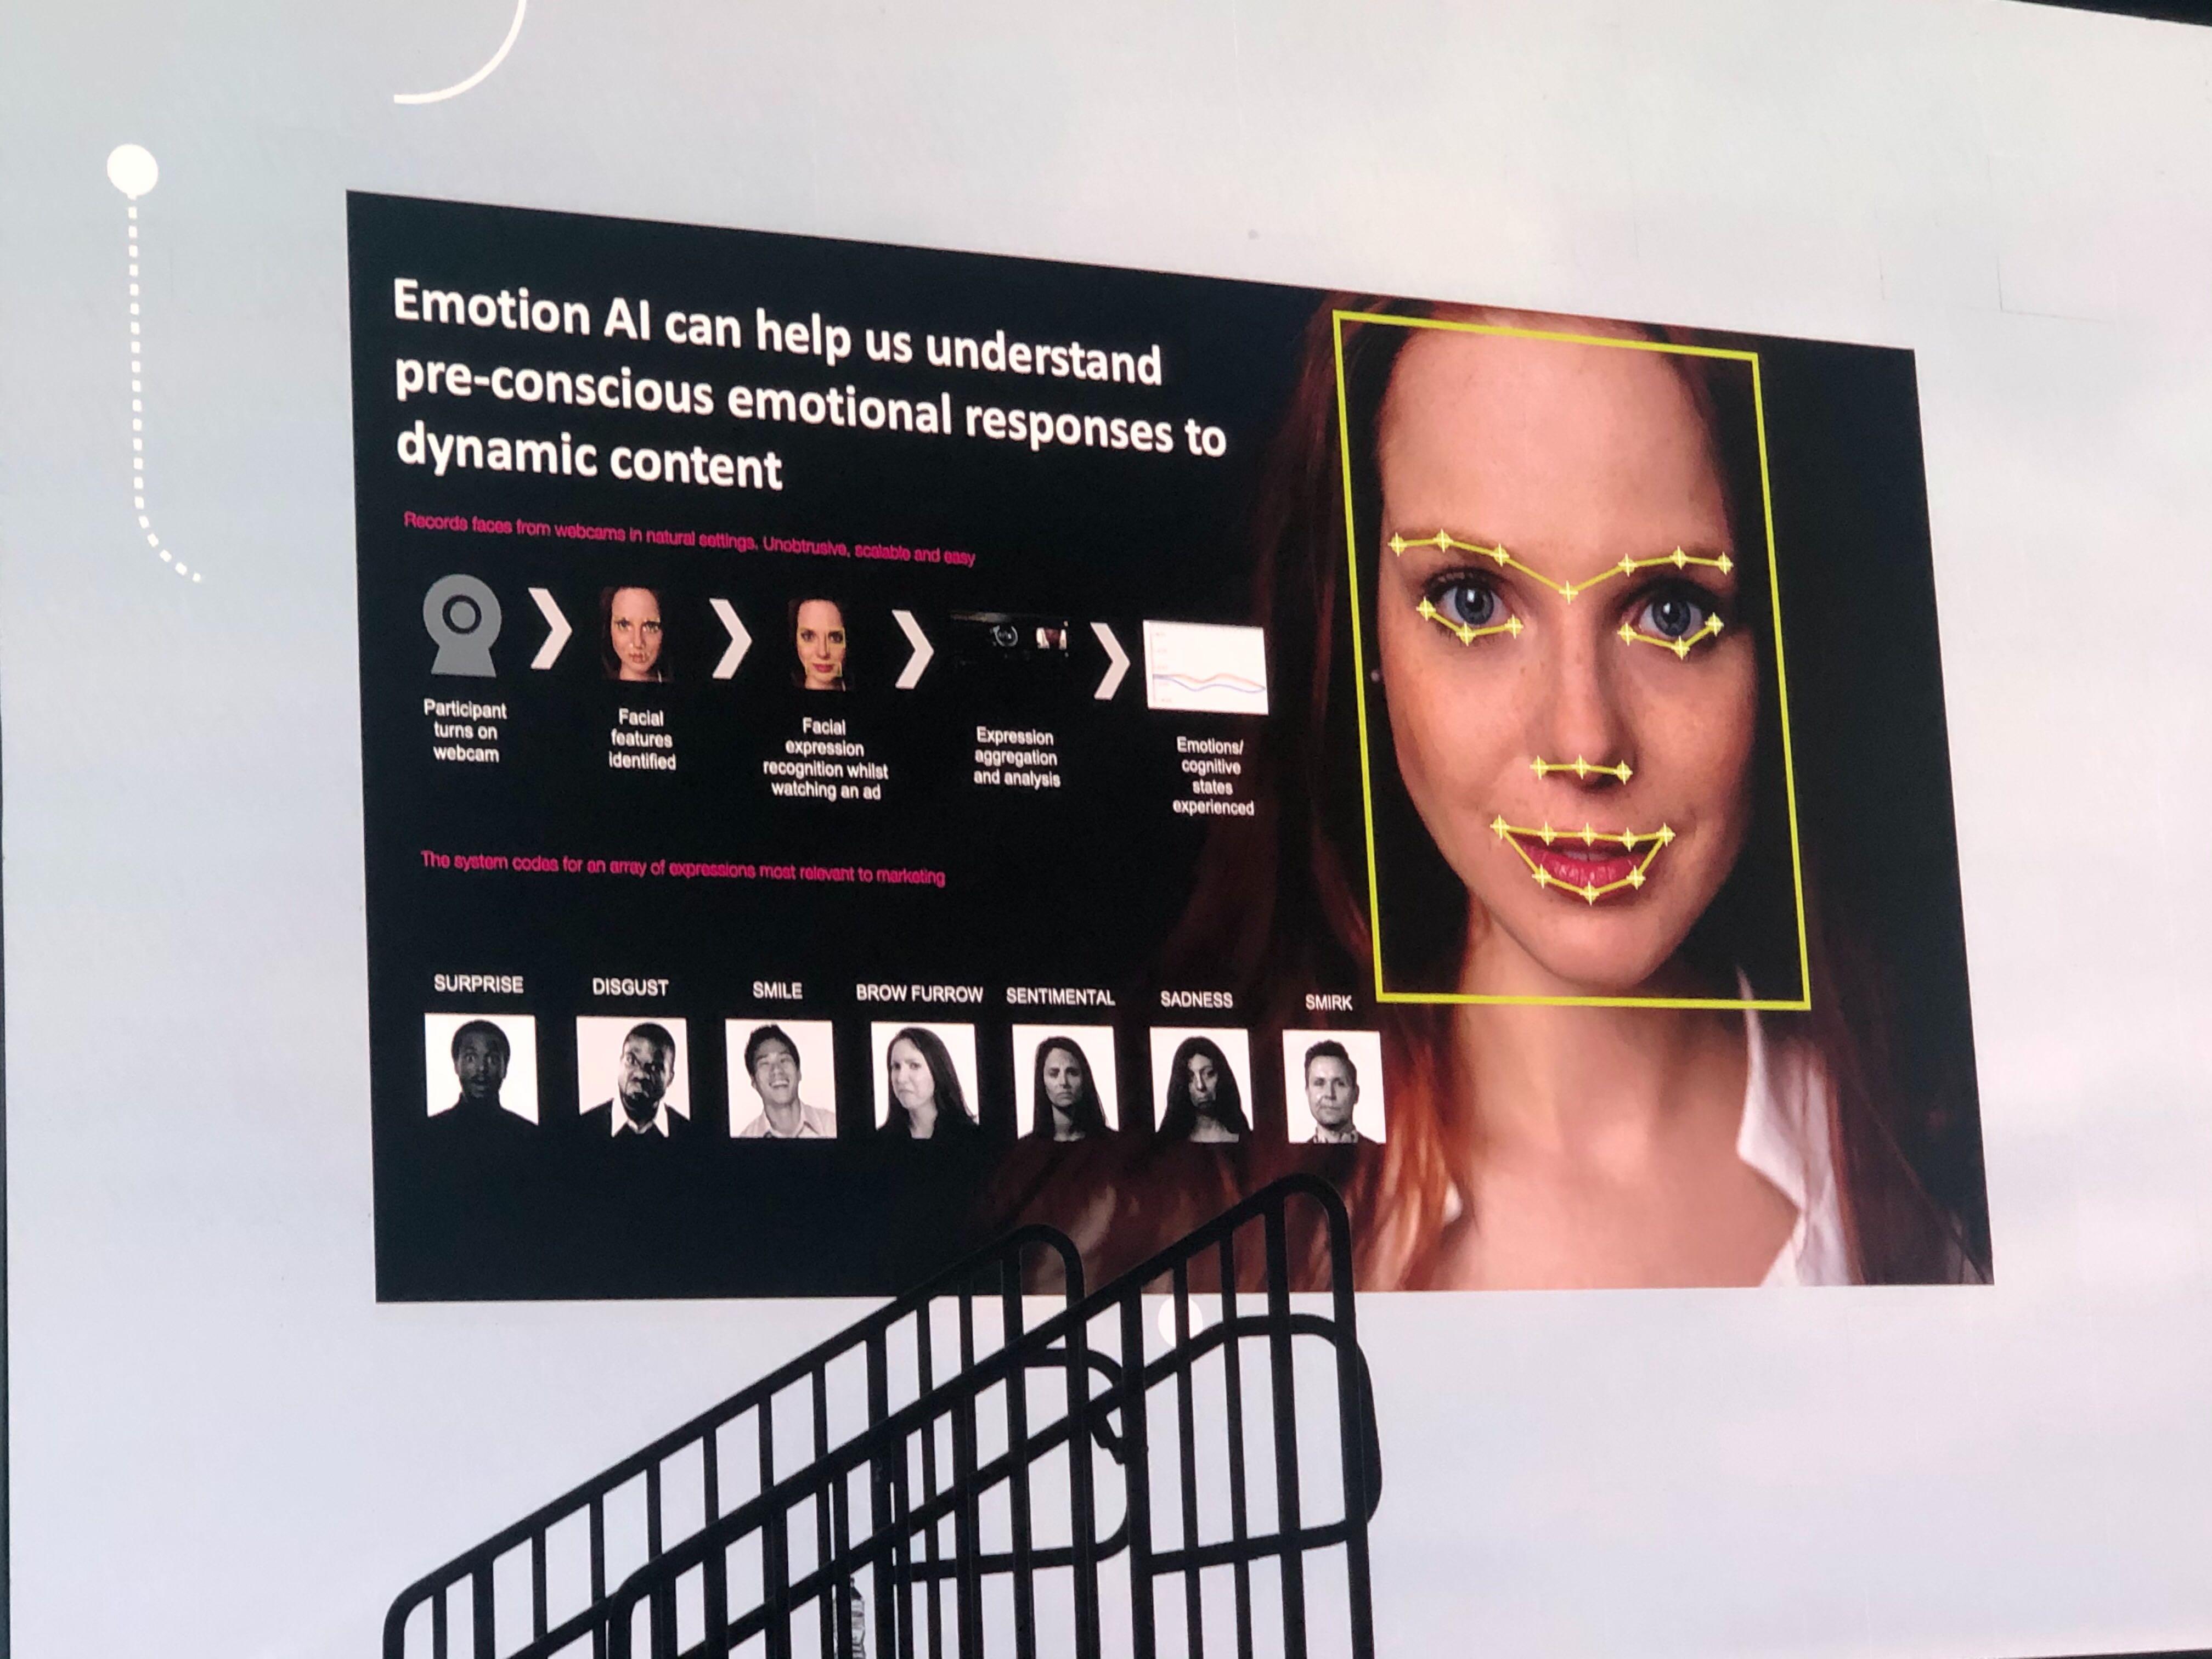 Emotion AI